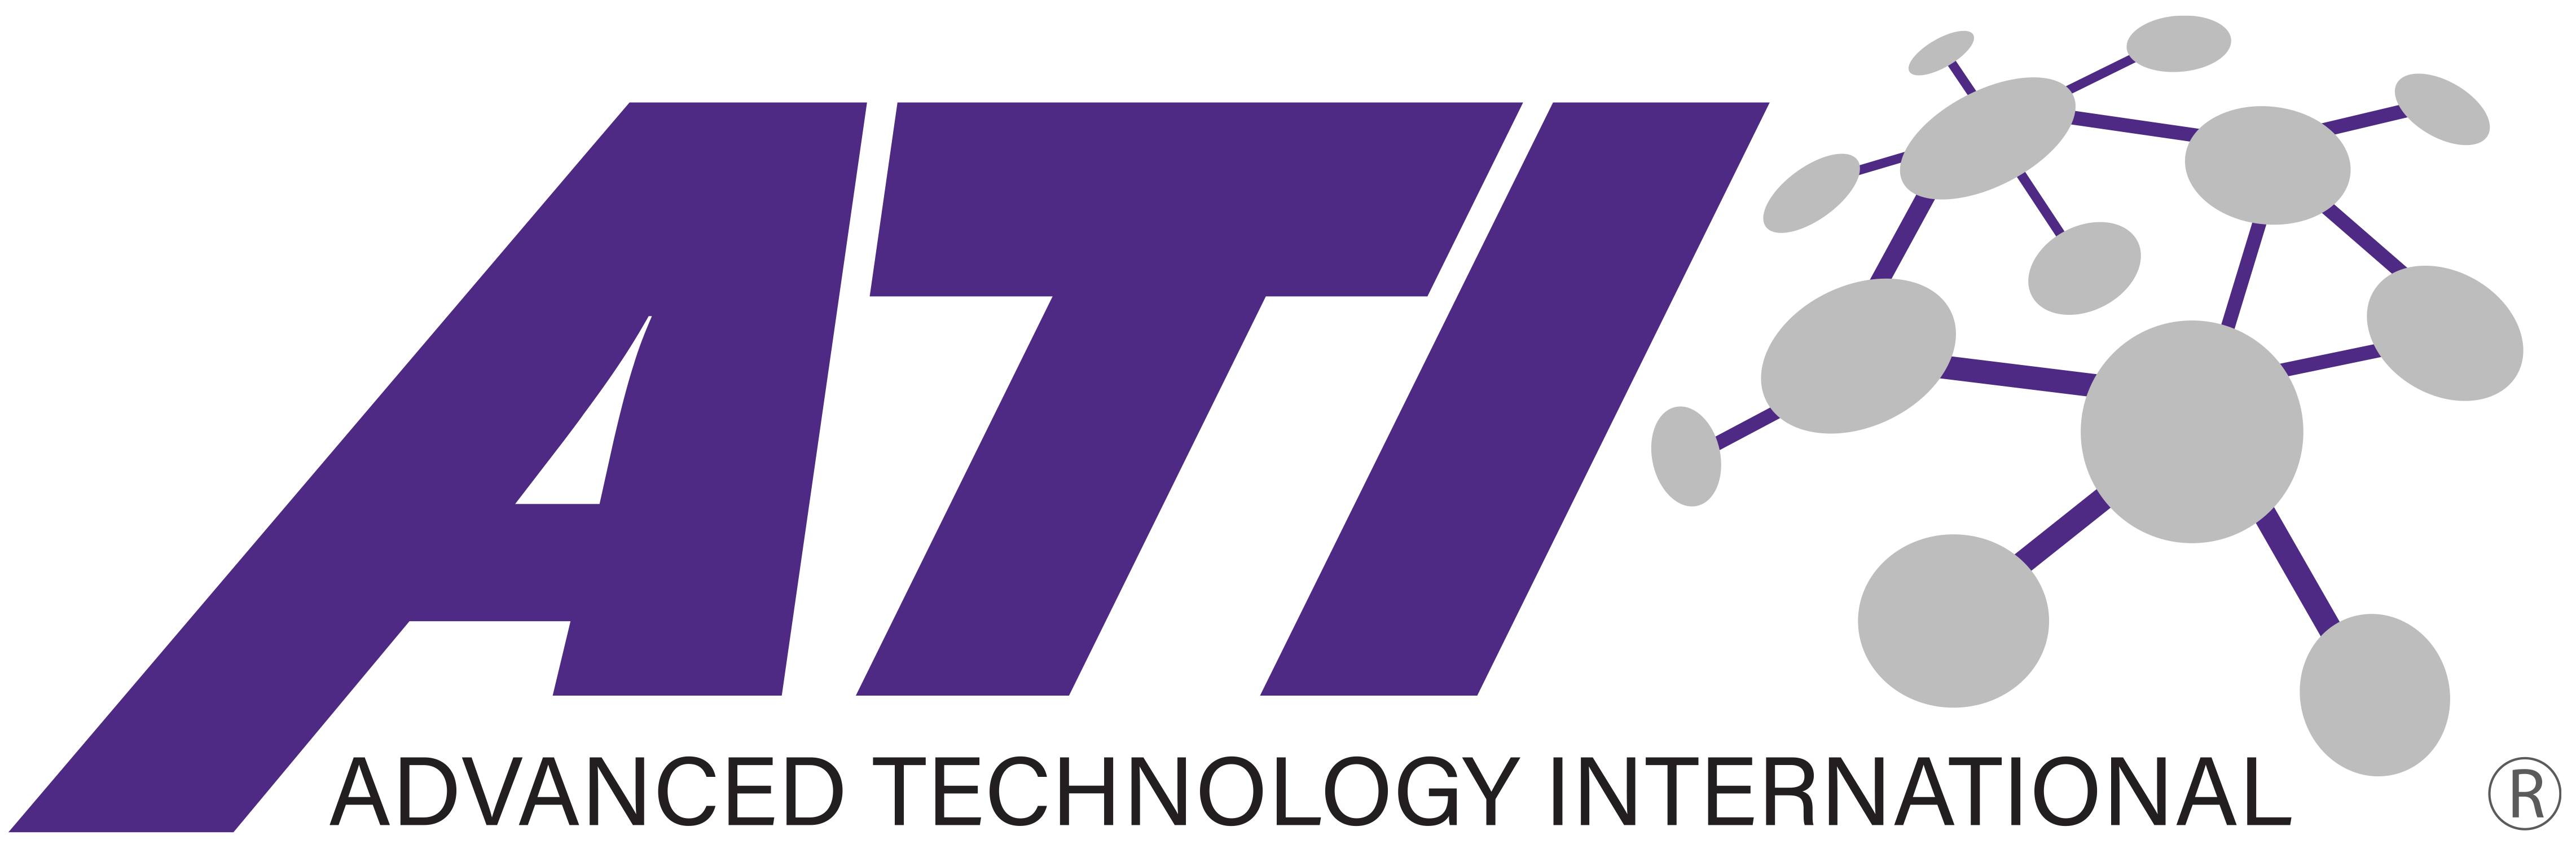 Advanced Technology International (ATI): Consortium Management Firm Logo